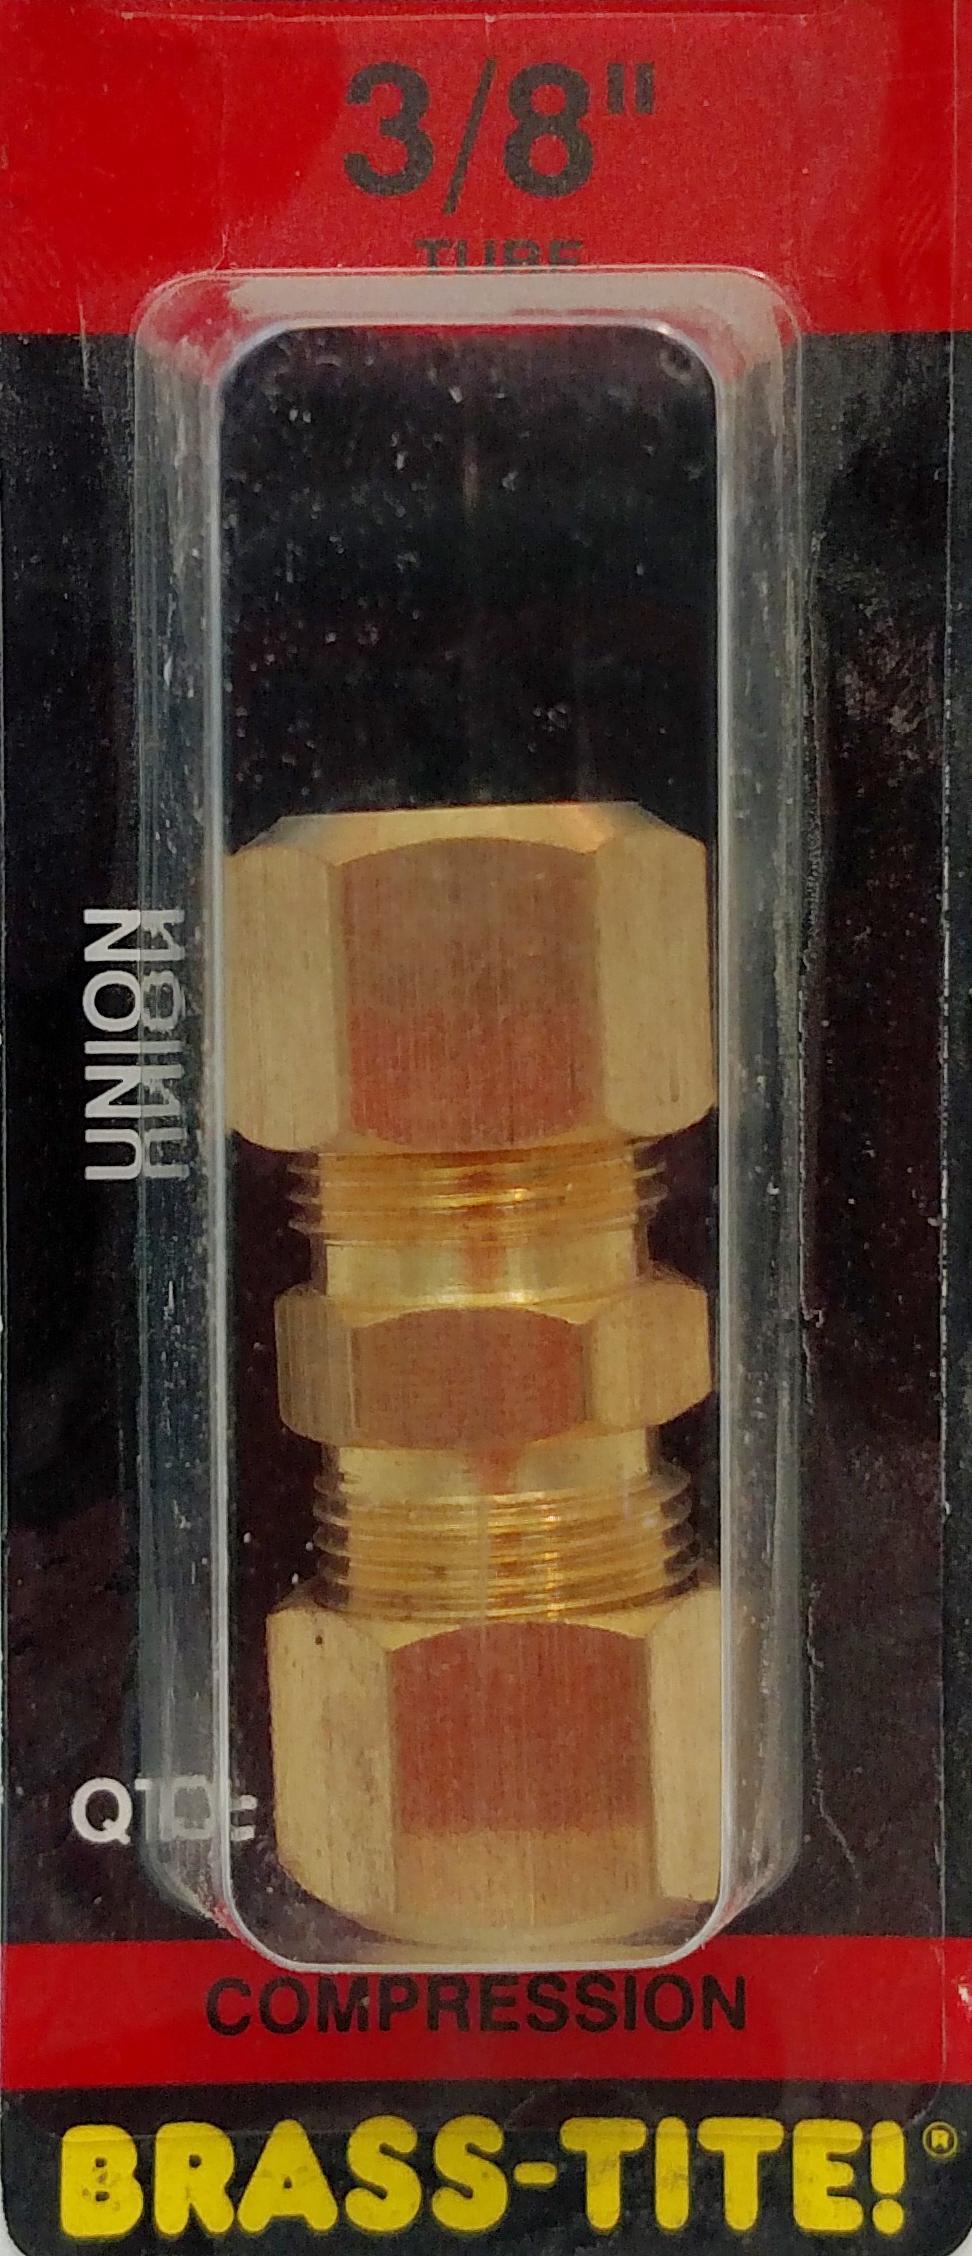 07443005 - Compression Union (Brass)